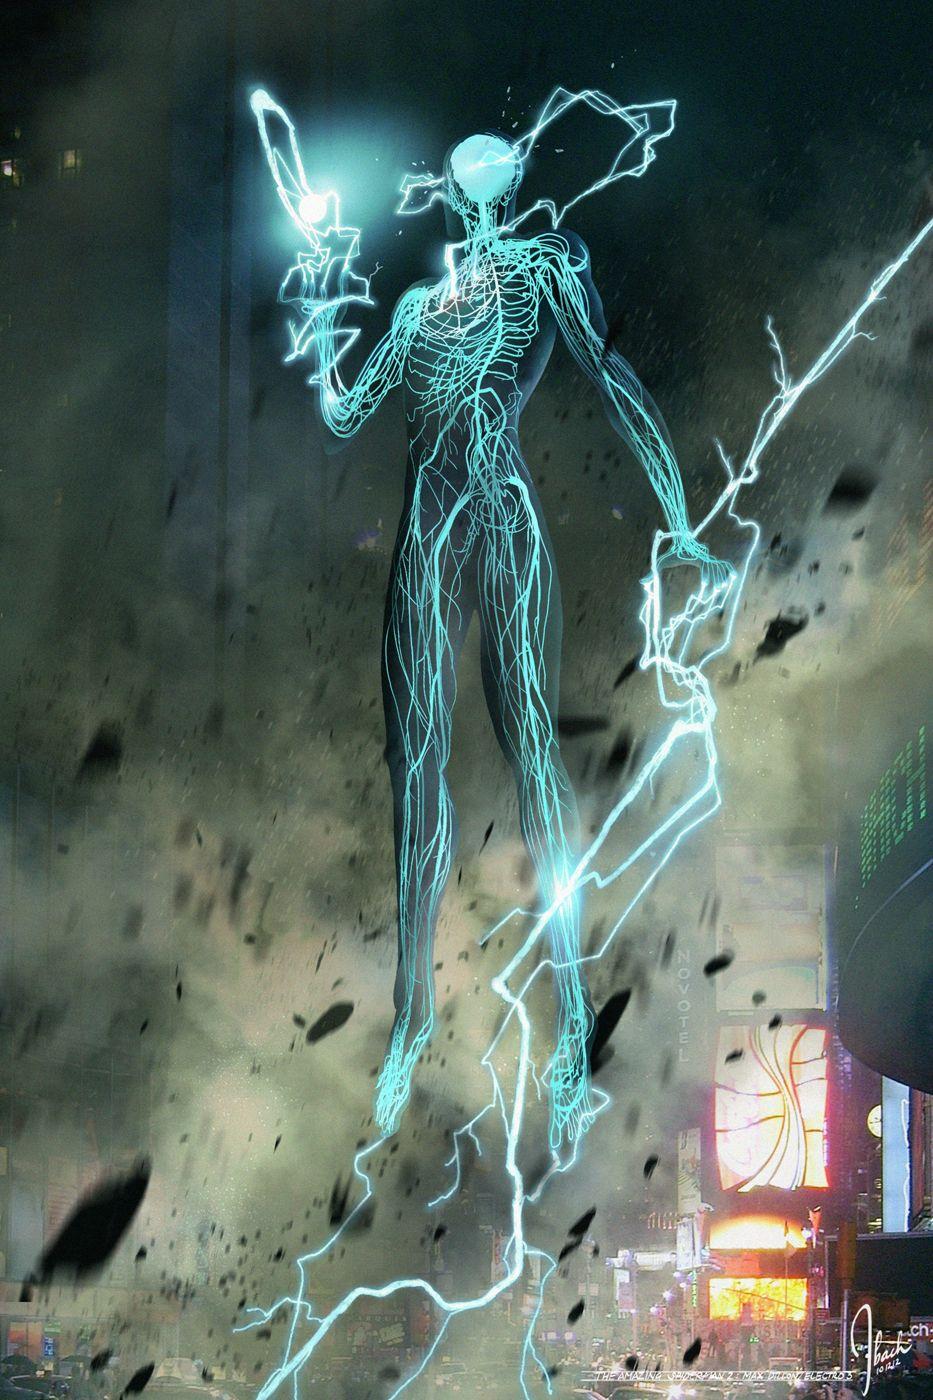 7vDv8Gm Amazing Spider Man 2 Electro Concept Art